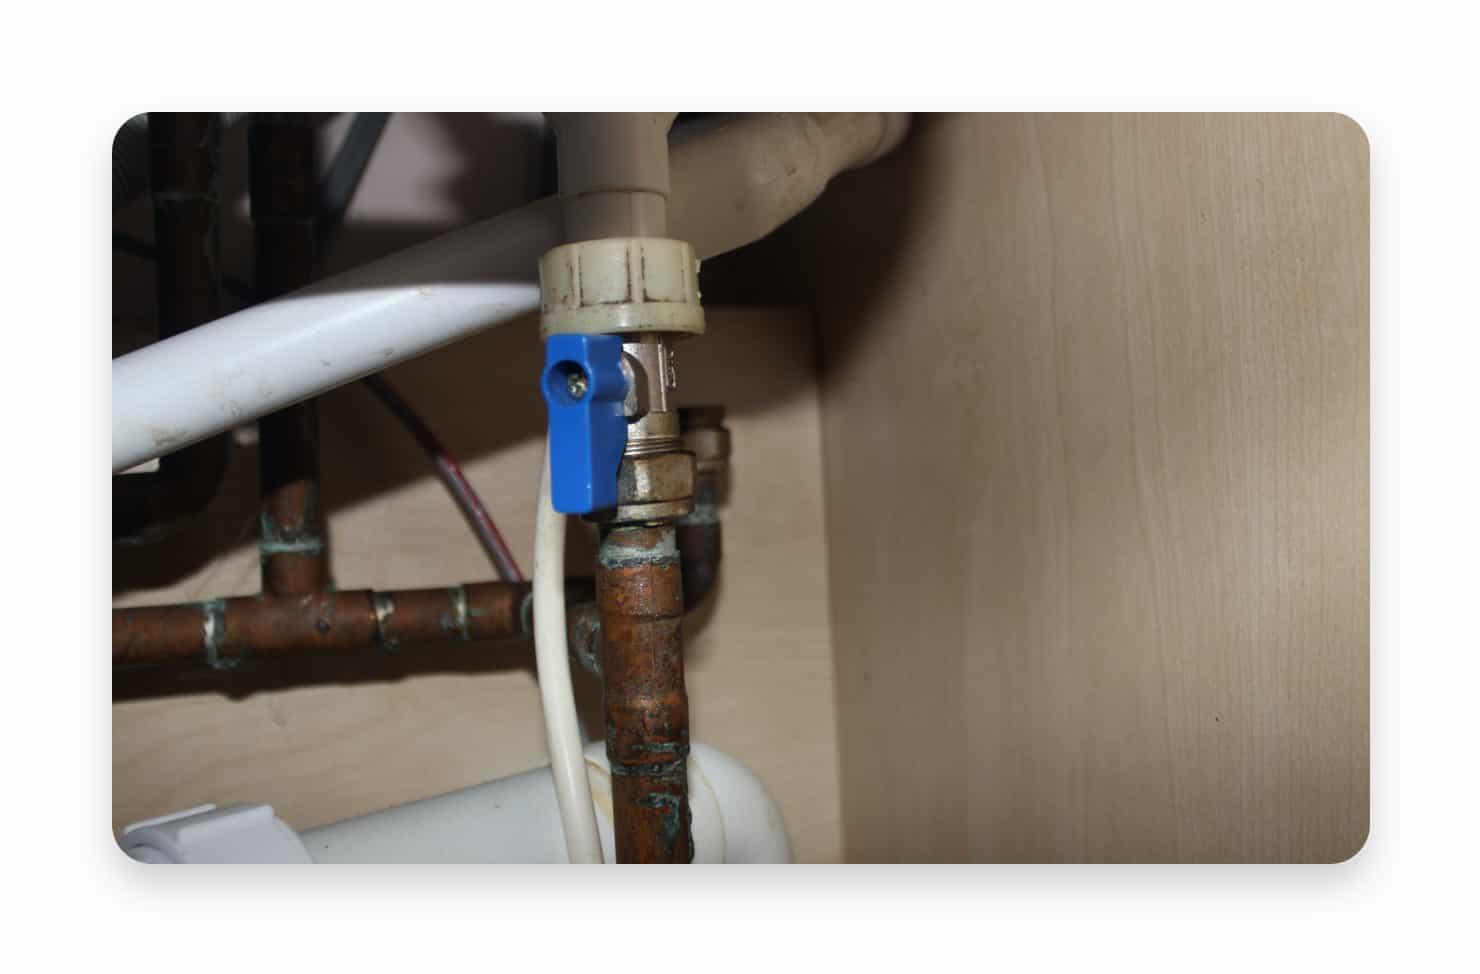 water supply valve